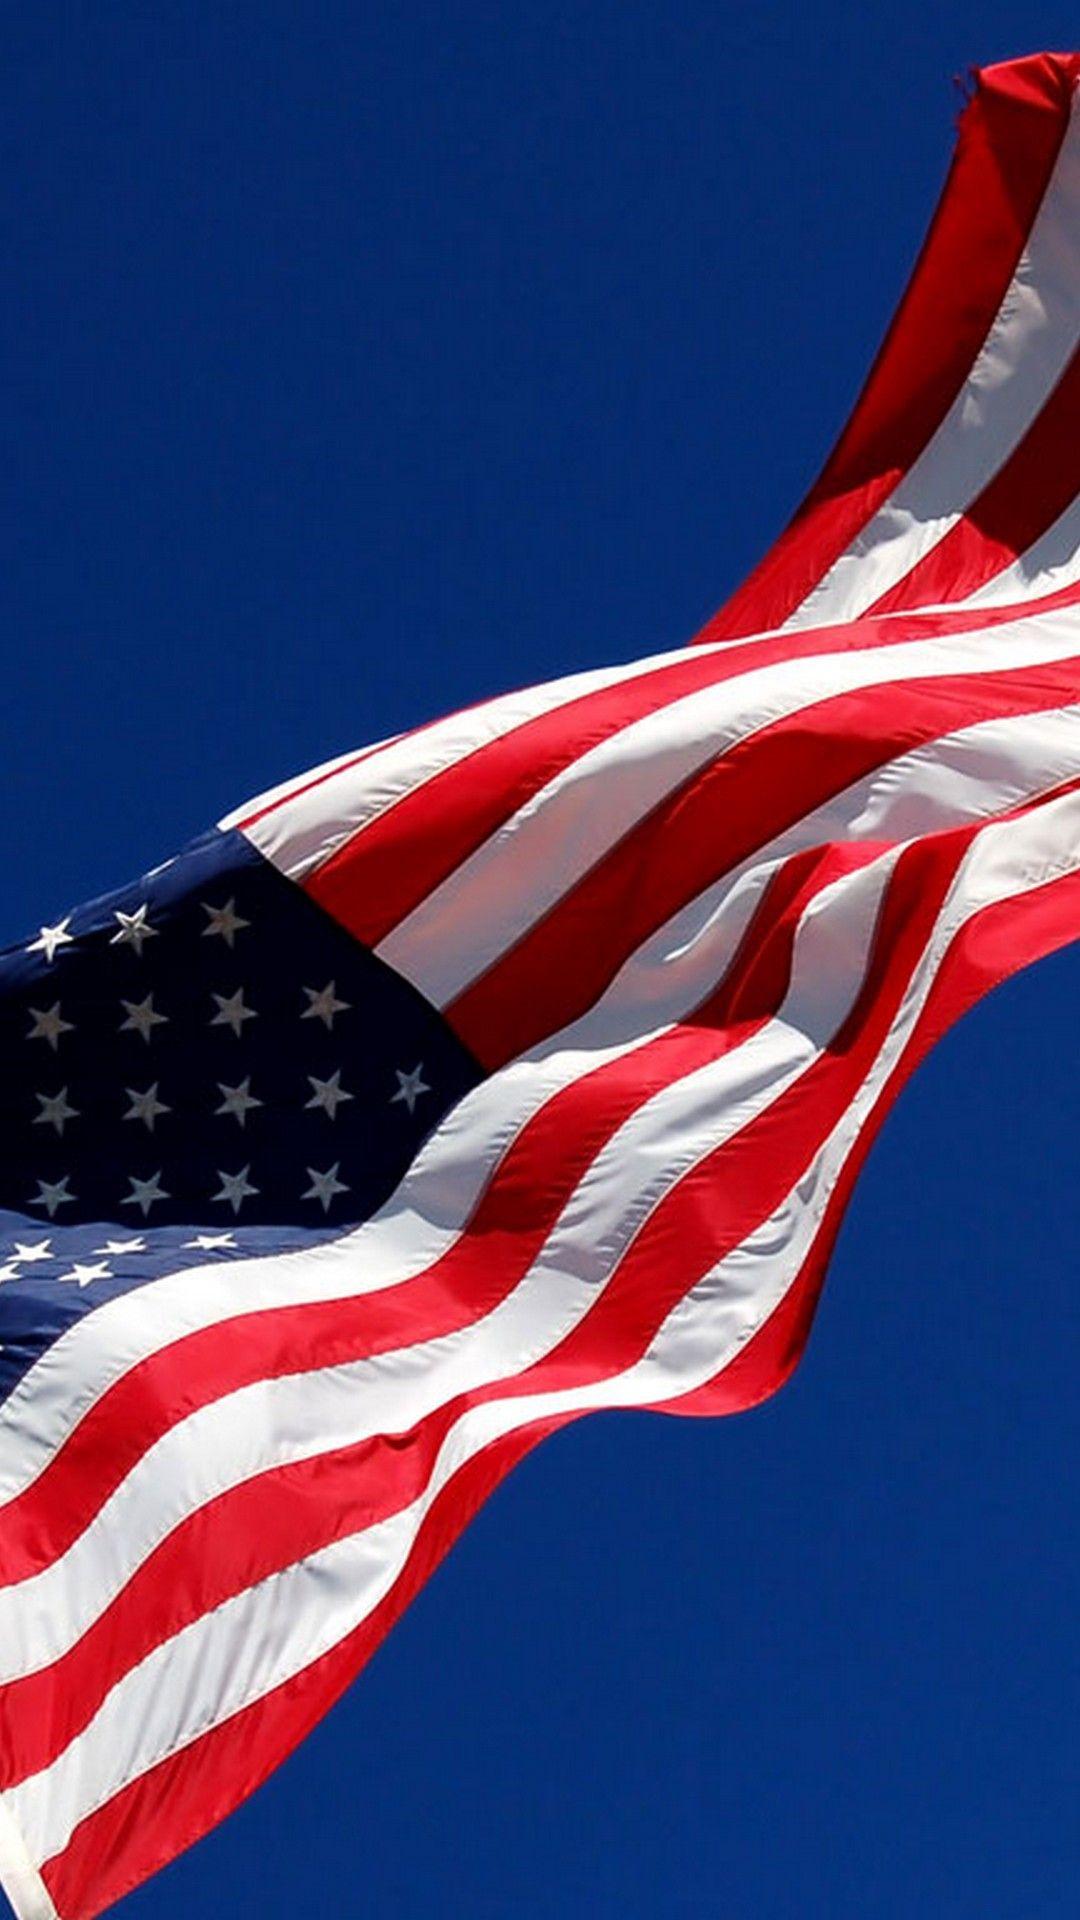 American Flag Picture American Flag Picture Wallpaper